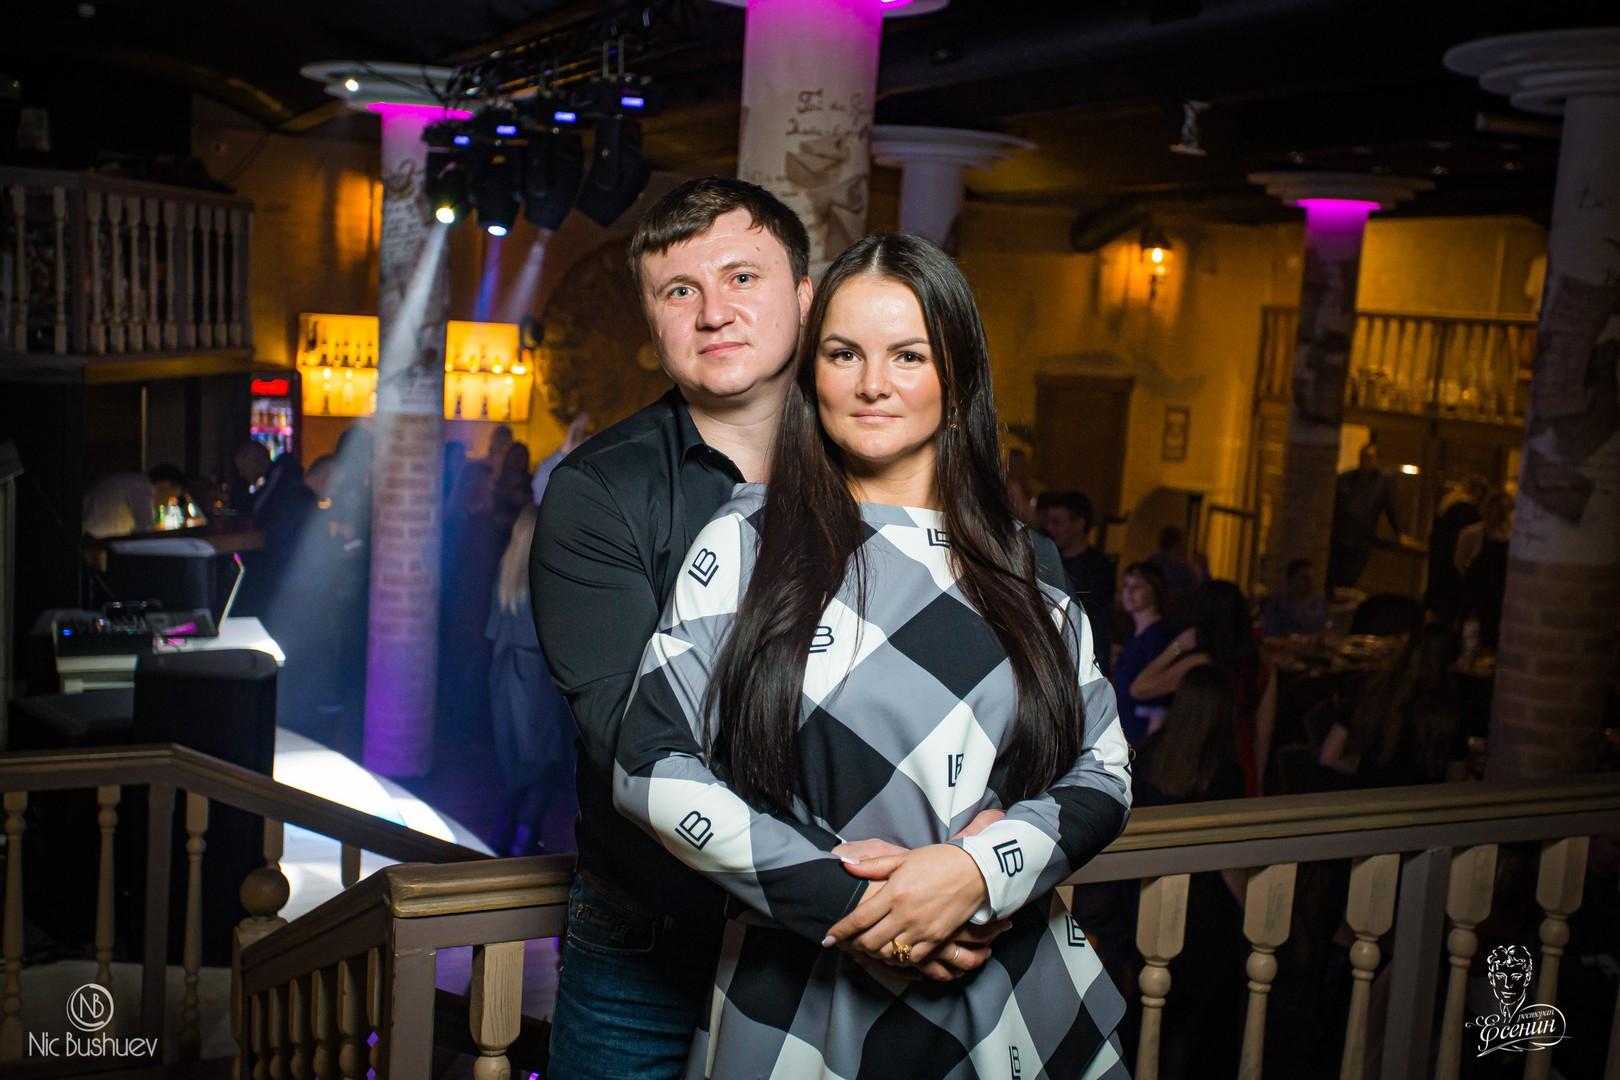 Ресторан Орехово-Зуево Есенин 29_02_2020 (36)